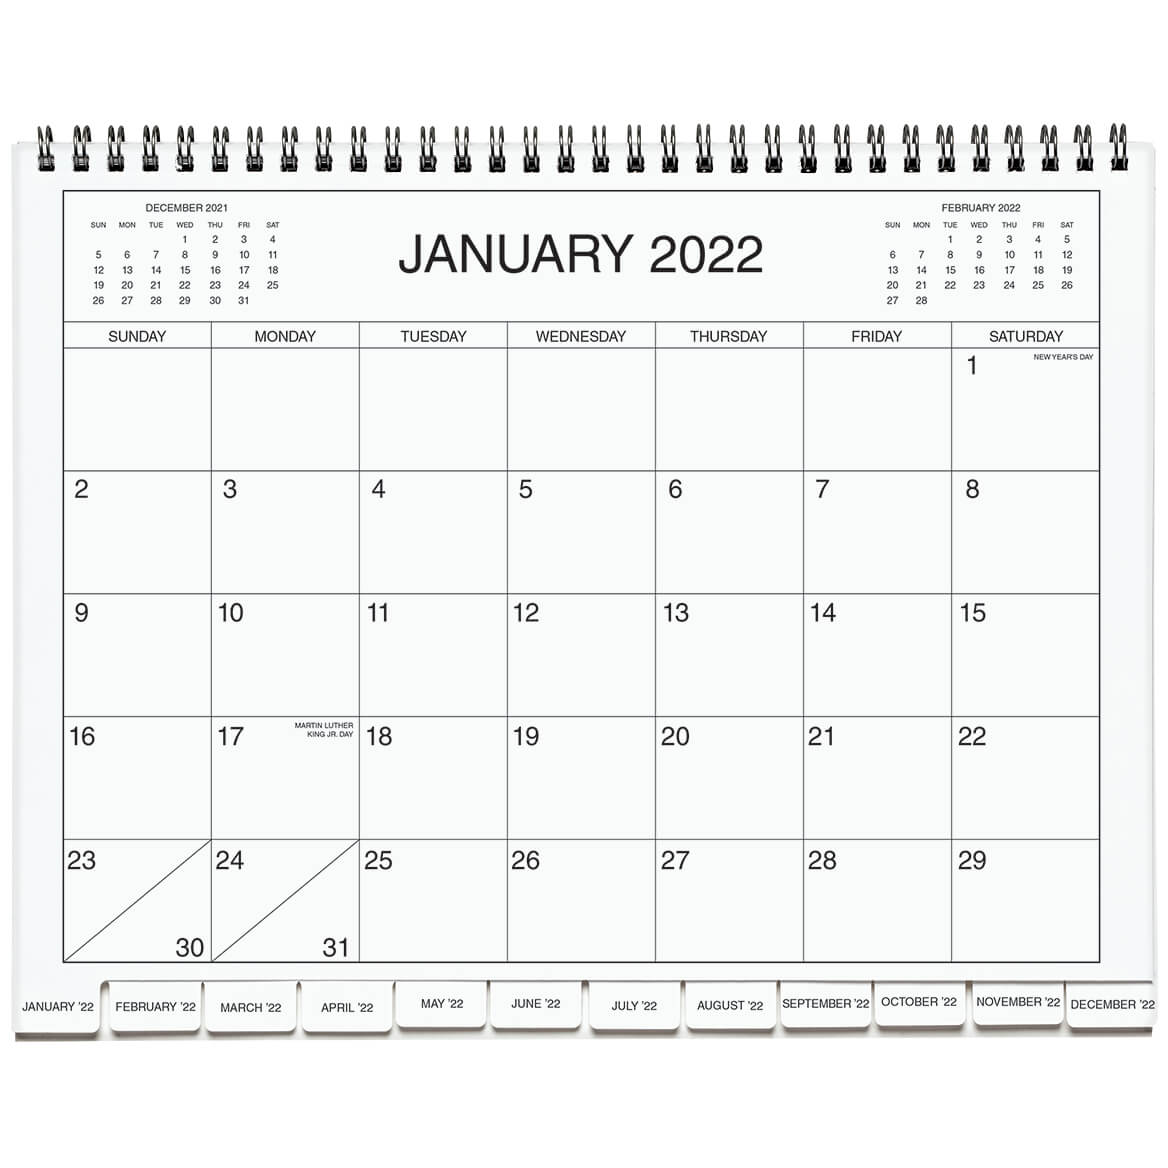 5 Year Calendar Diary 2022 2026 Blue-369609